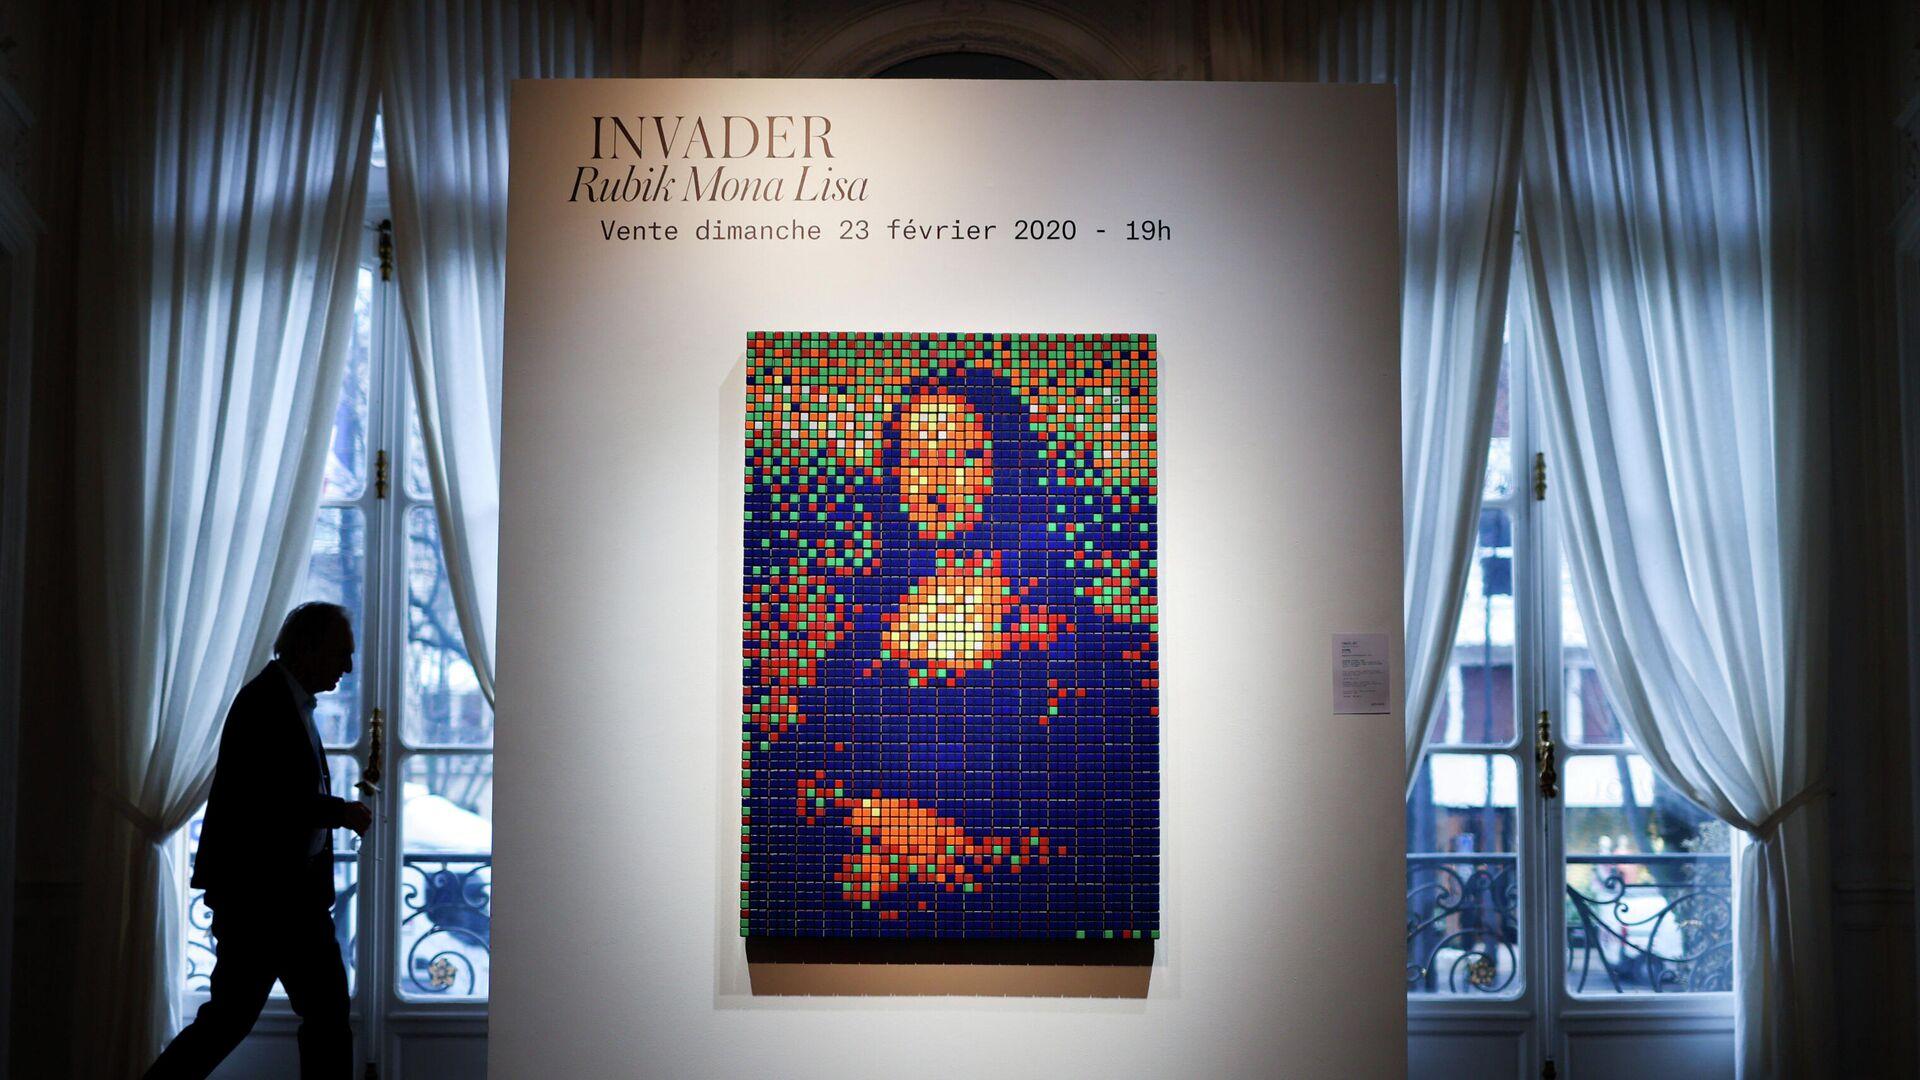 Мона Лиза из кубиков Рубика французского уличного художника под псевдонимом Invader - РИА Новости, 1920, 24.02.2020